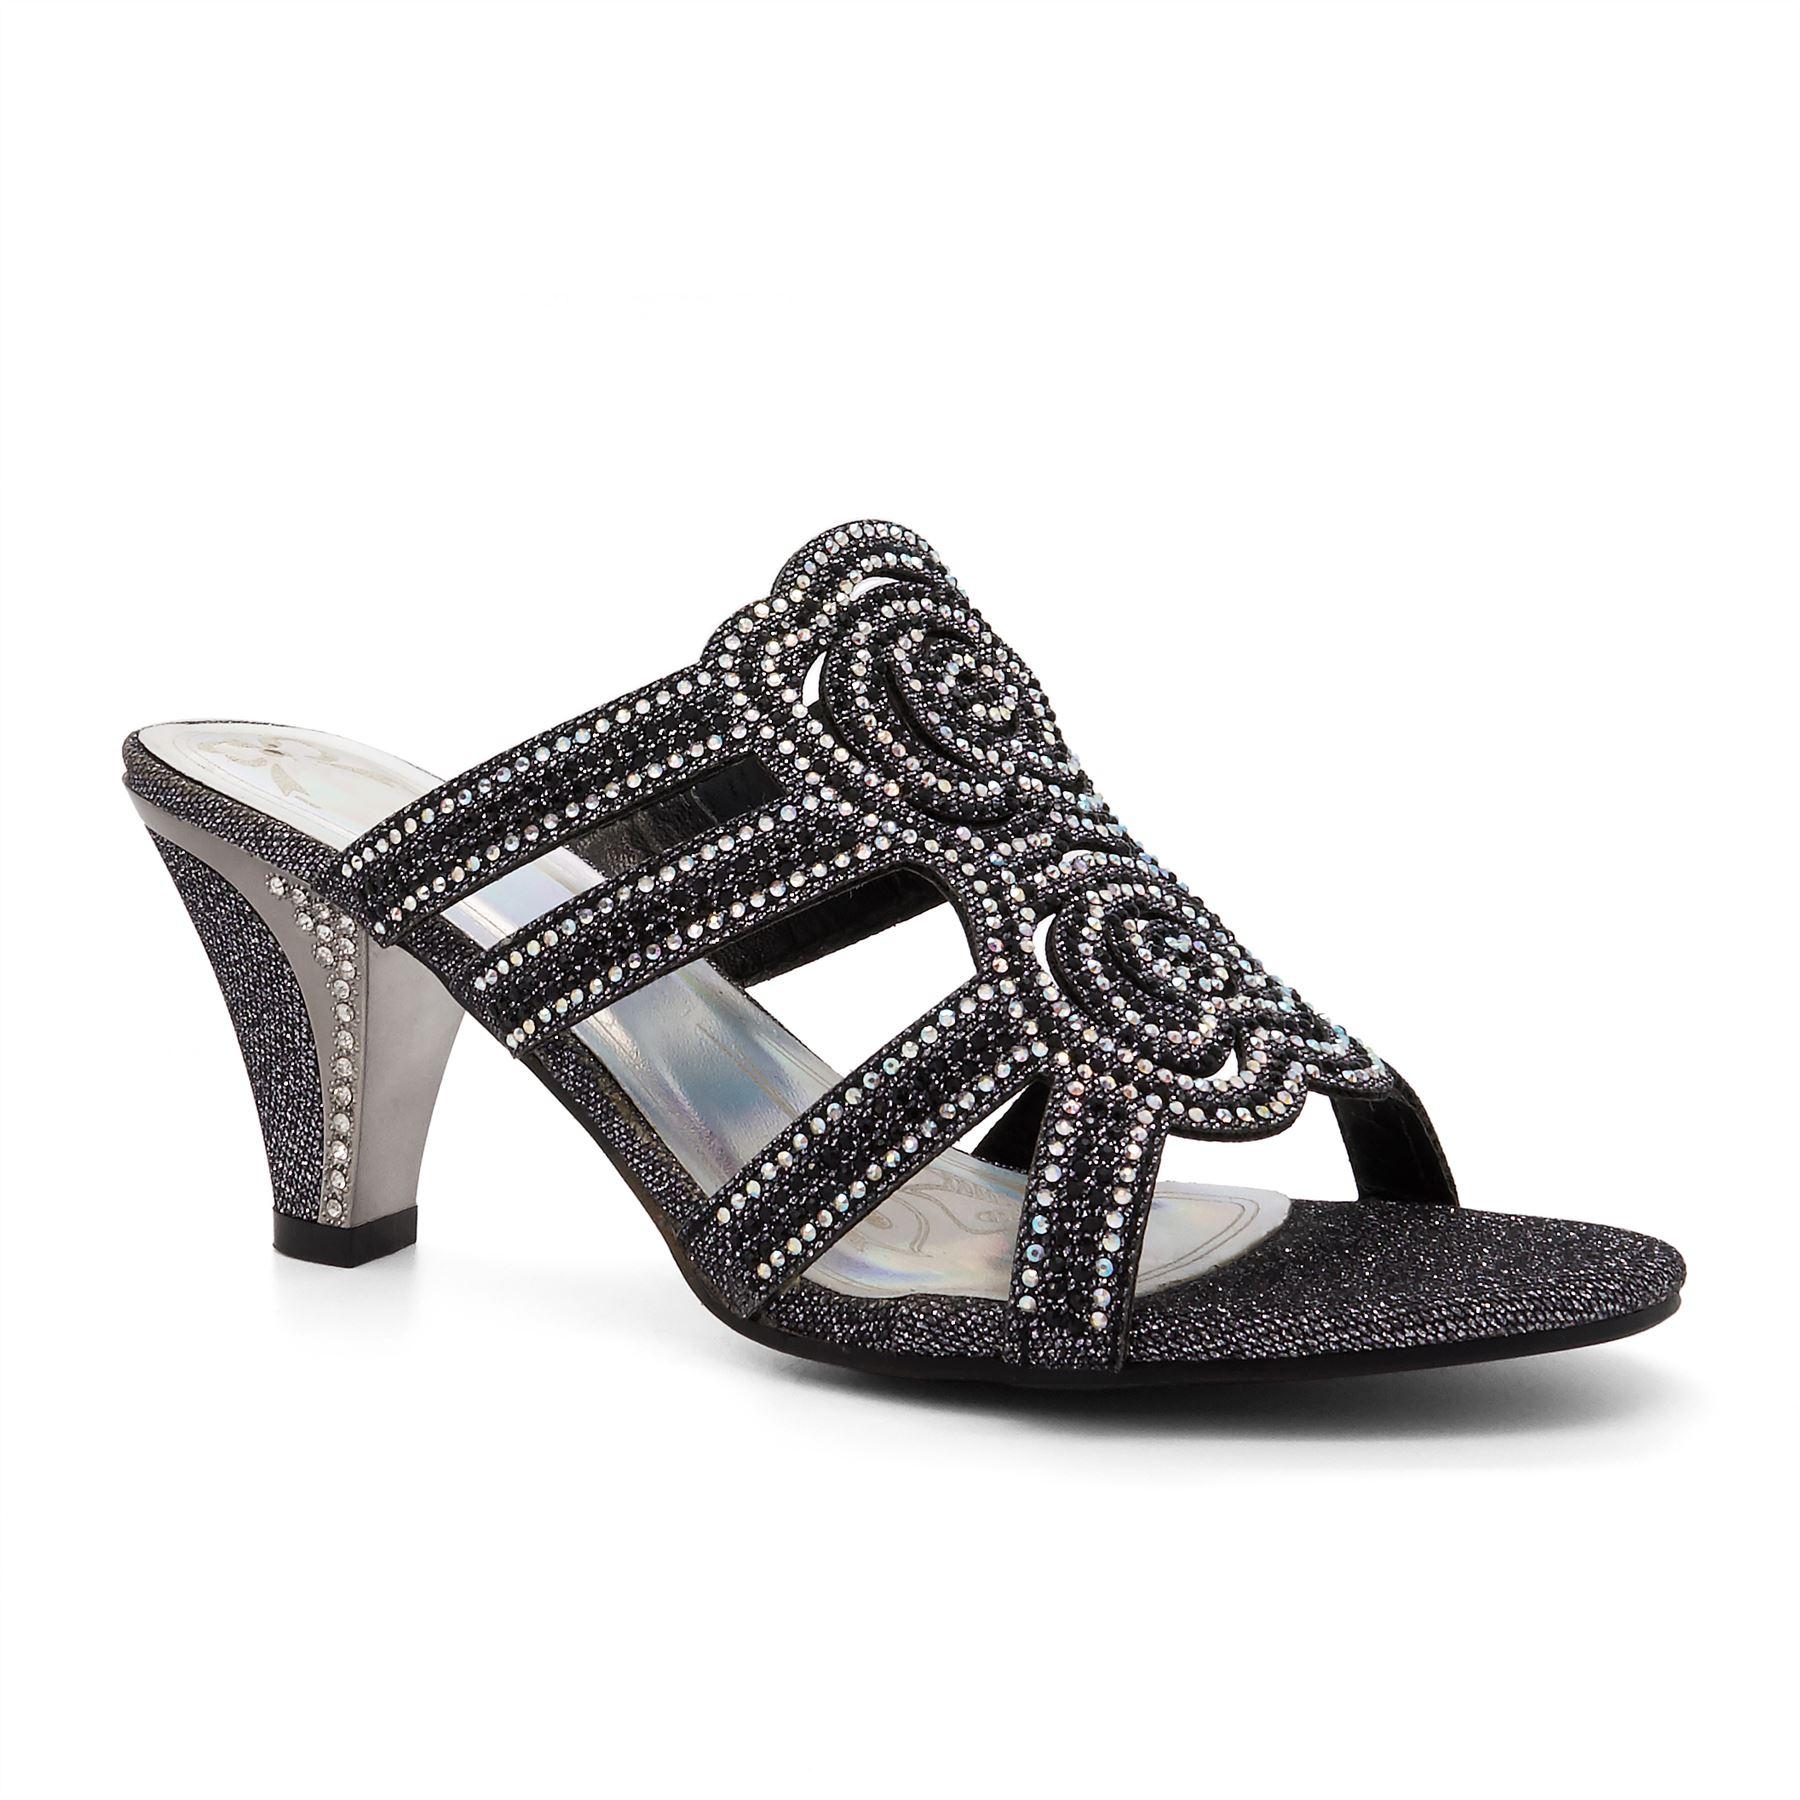 Womens-Ladies-Diamante-Wedding-Low-Mid-Heel-Sandals-